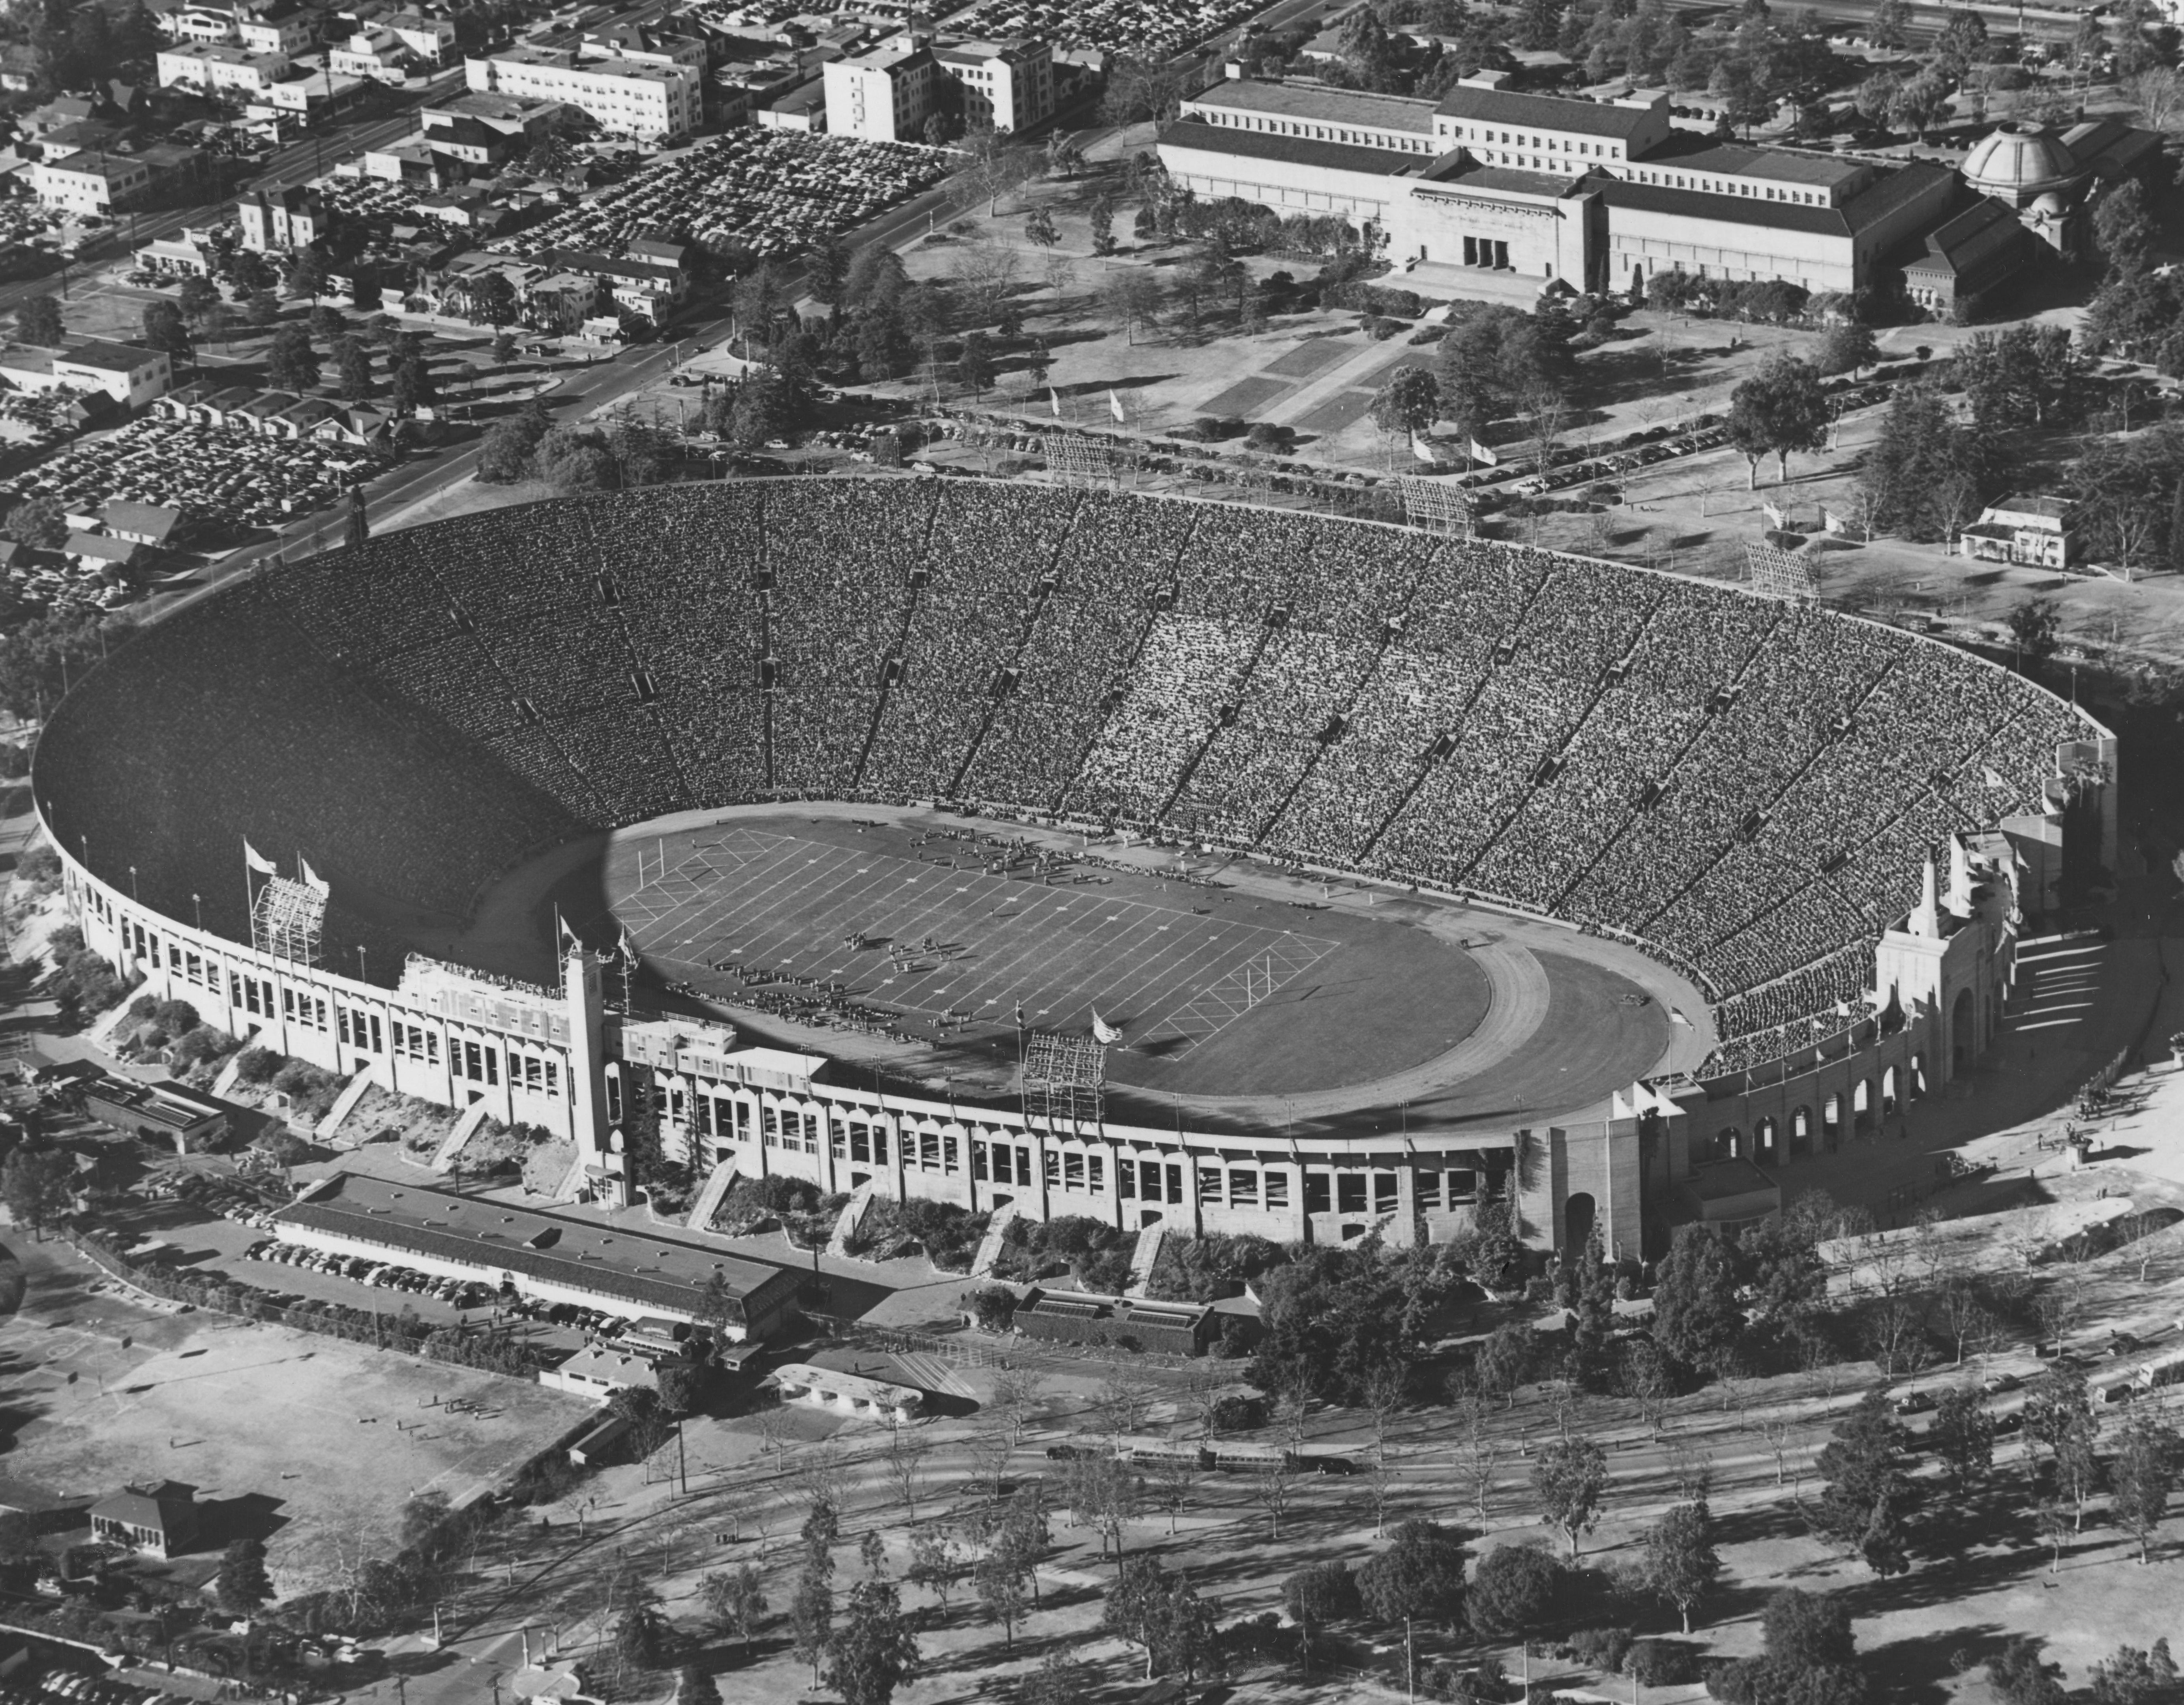 USC football in 1948